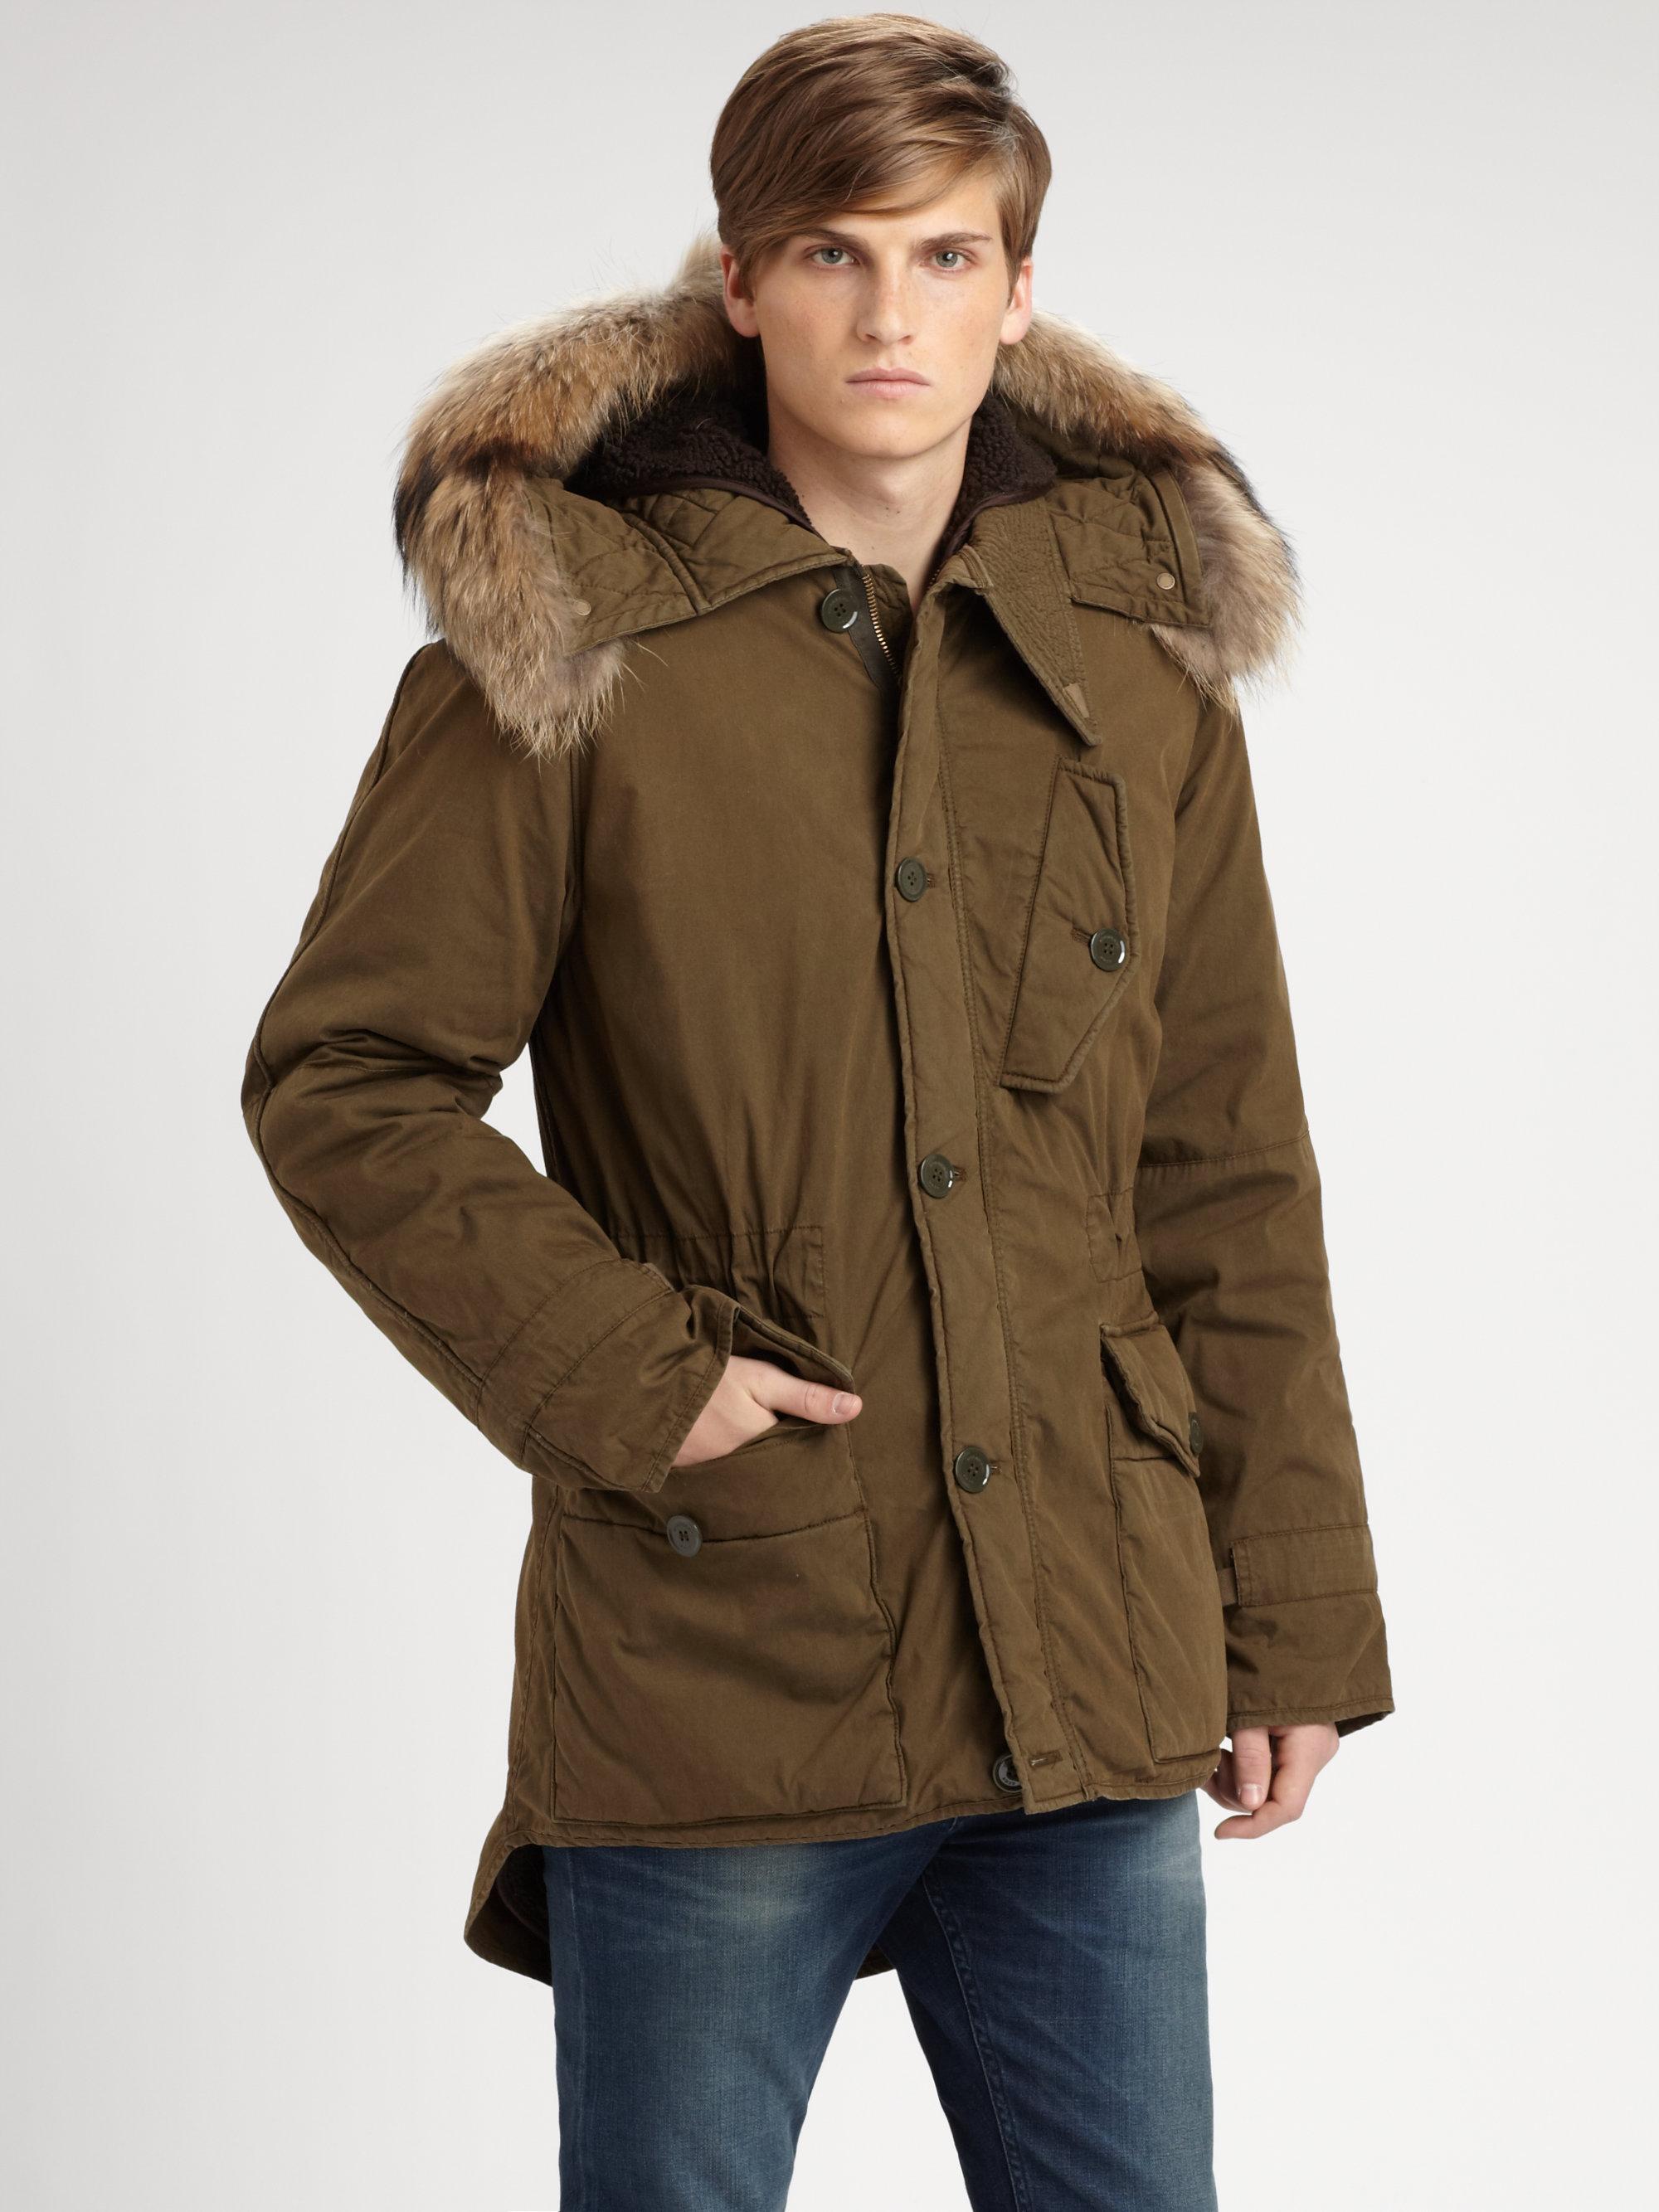 Lyst Burberry Brit Fur Hood Cotton Parka In Green For Men